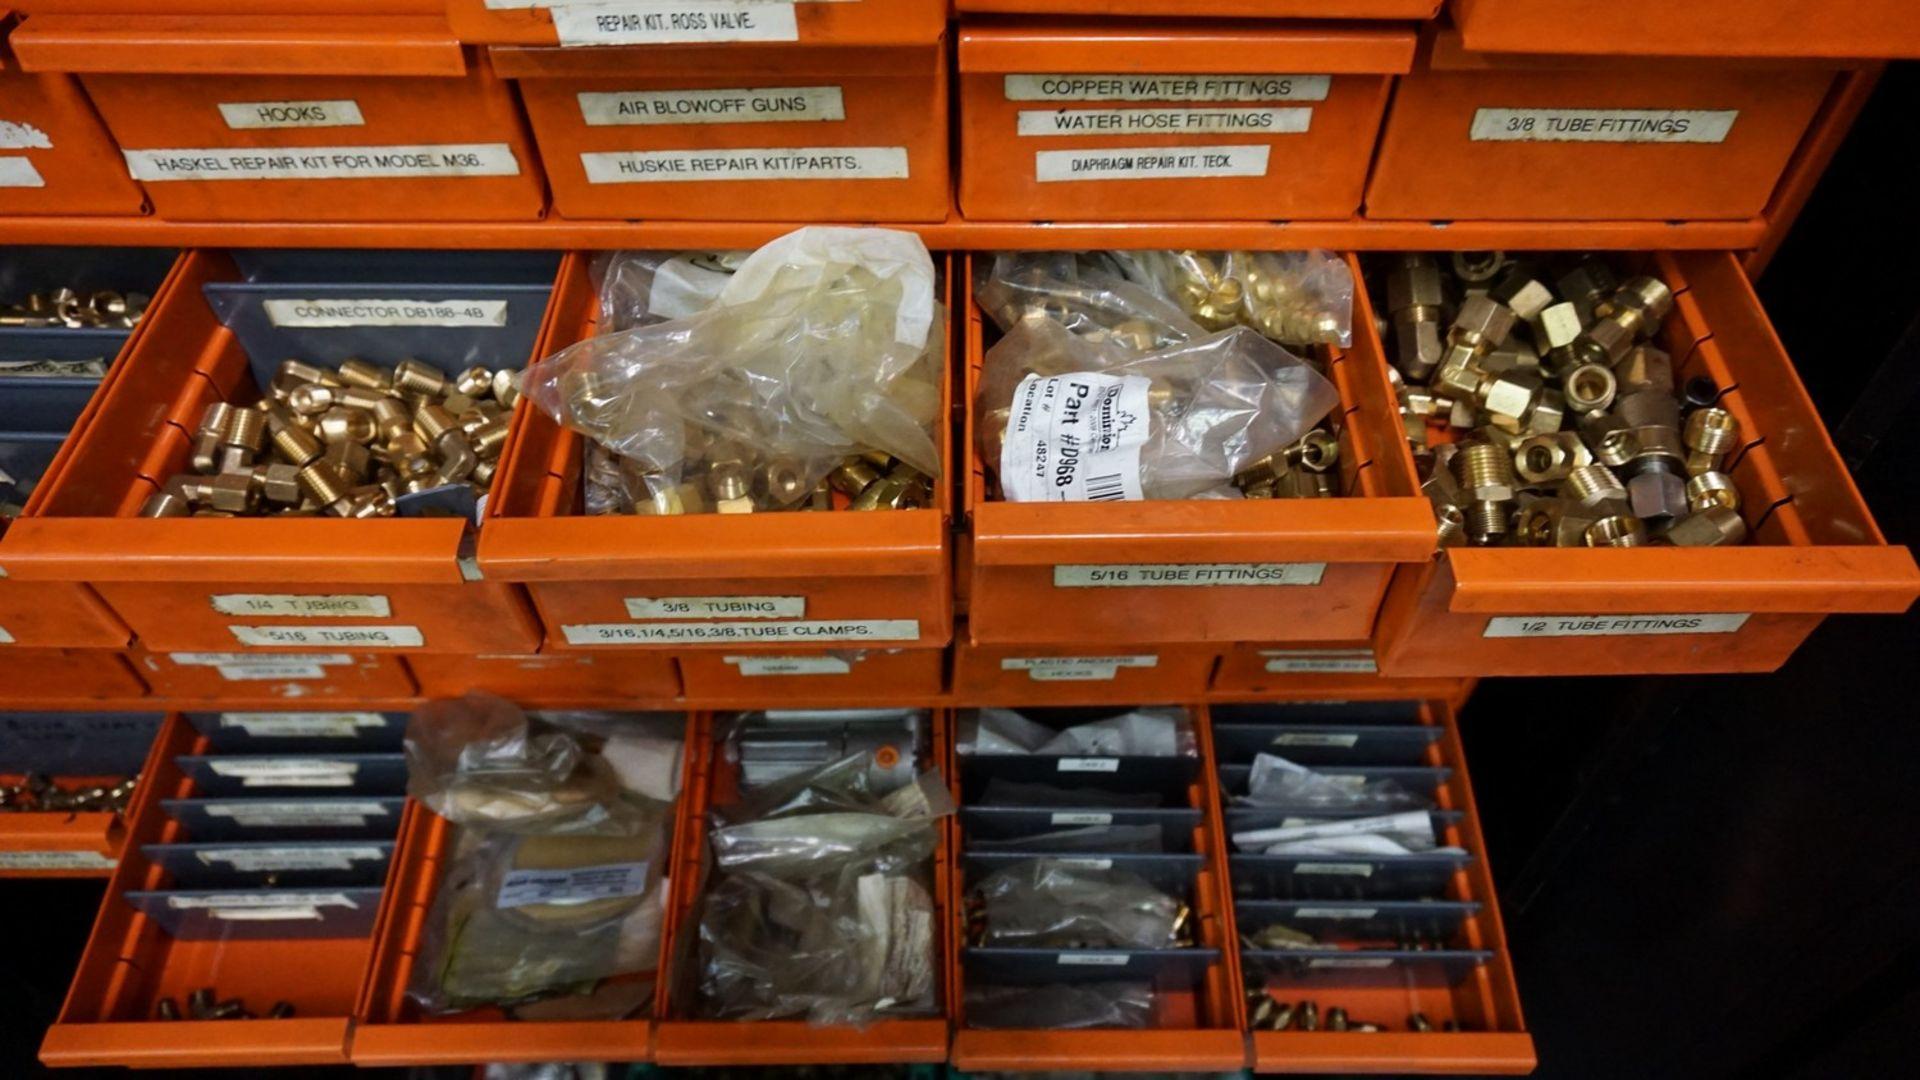 Lot 35 - Asst. Parts Bin with Contents & 2-Door Supply Cabinet